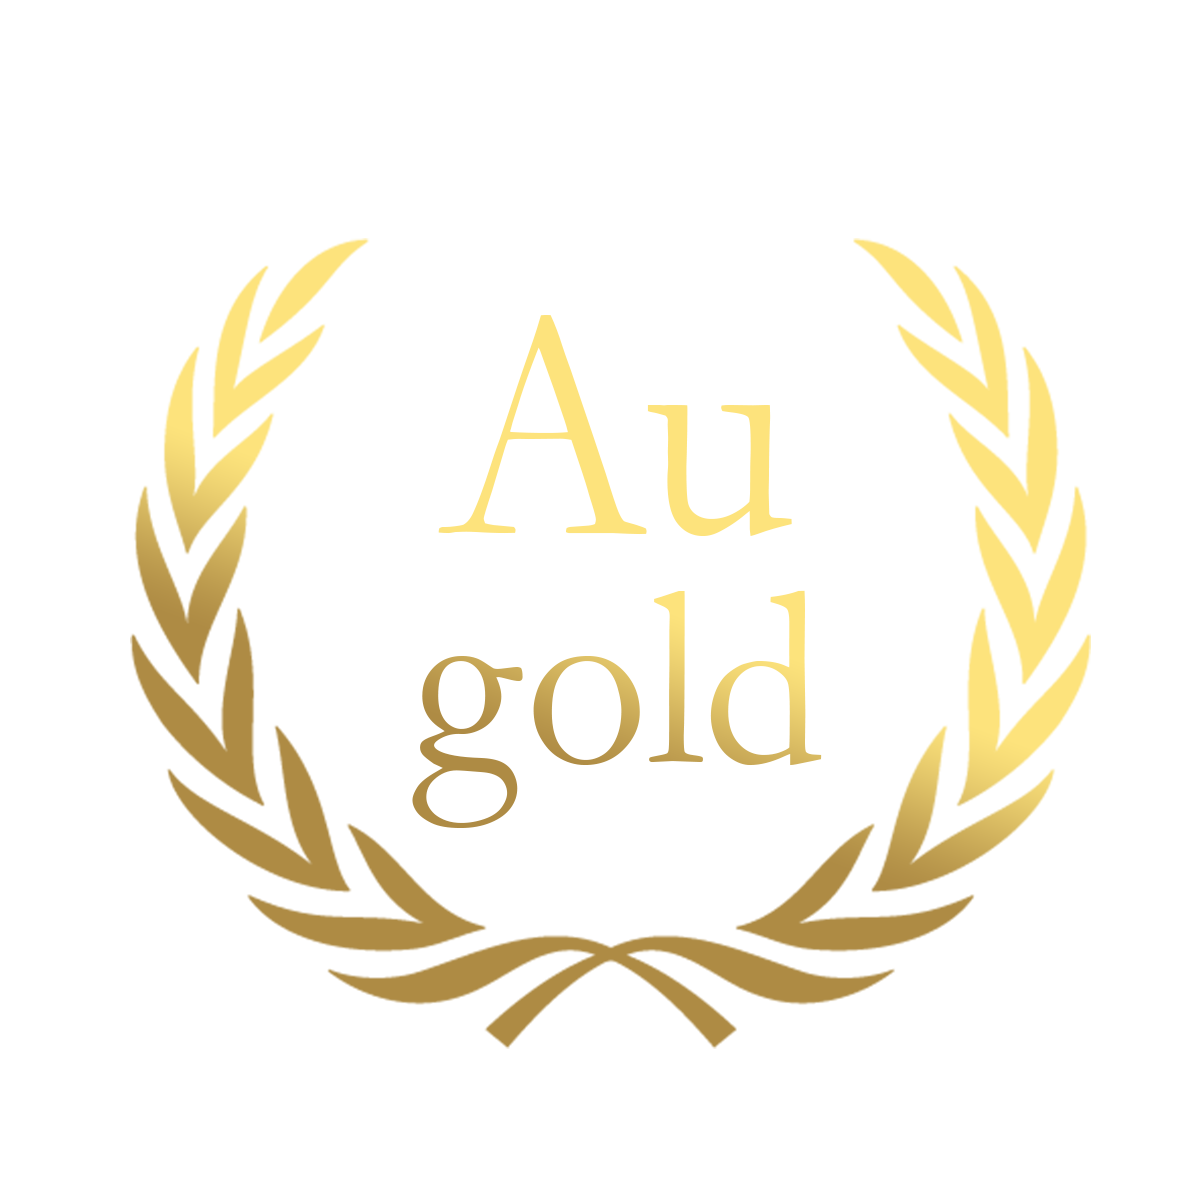 auraaugoldsuna